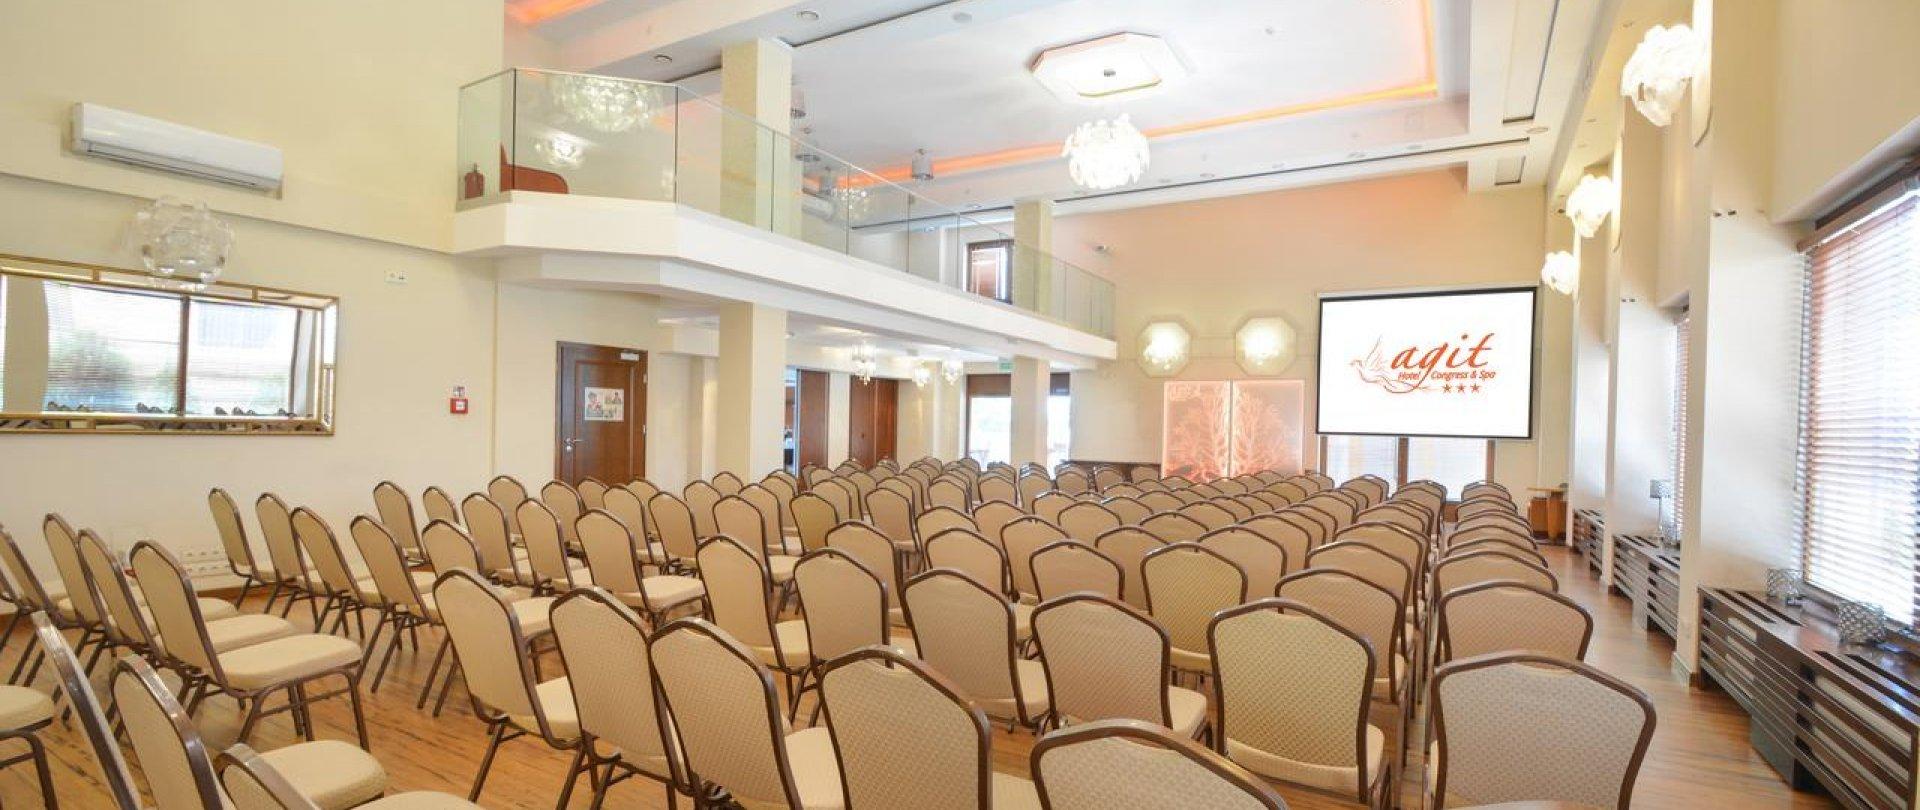 Agit Hotel Congress & SPA, Lublin